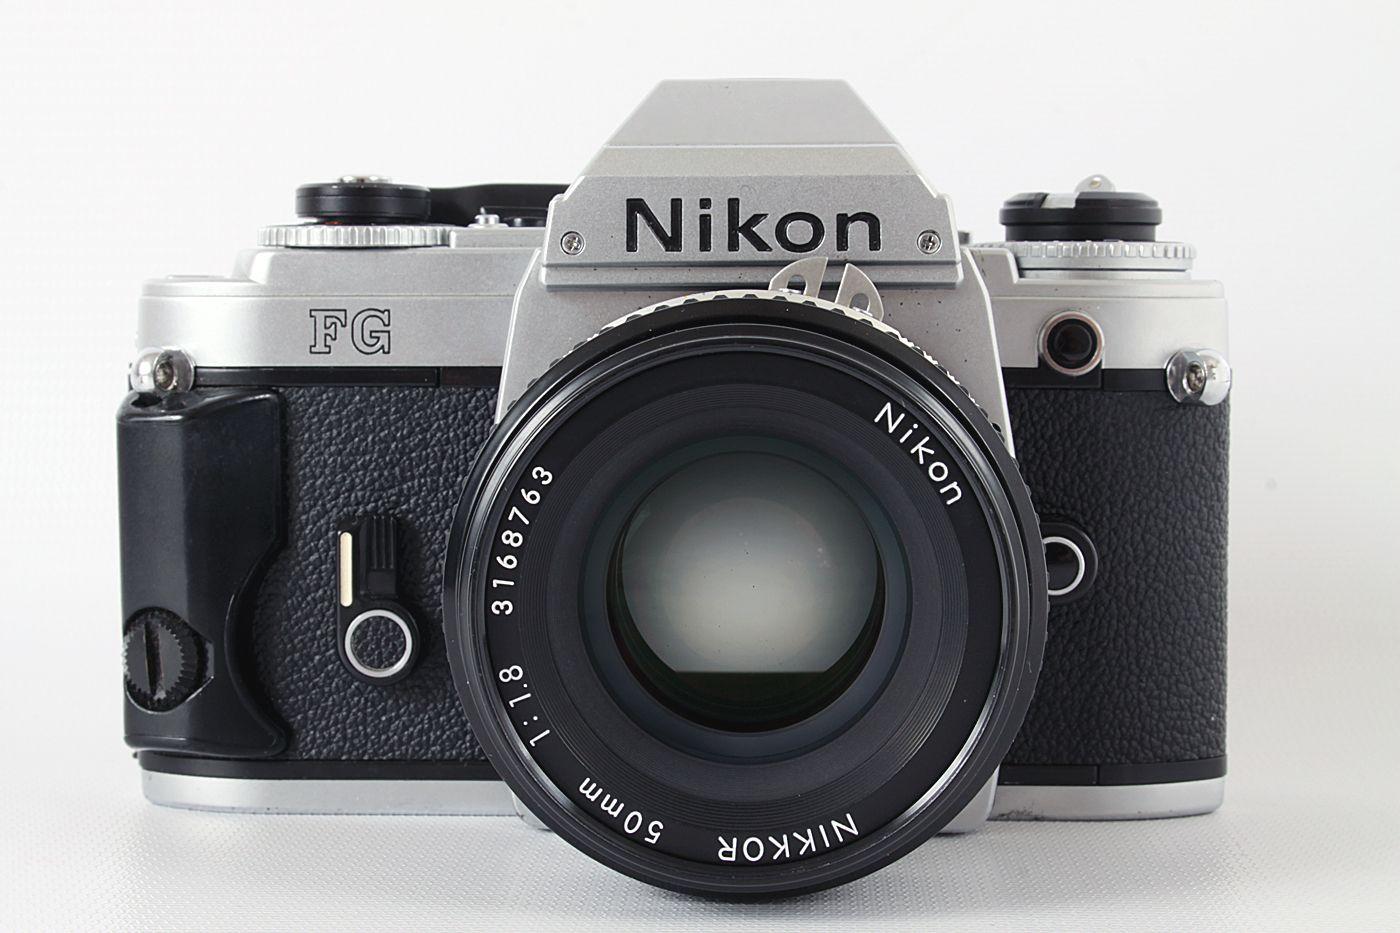 nikon fg chrome film slr stuff pinterest nikon film camera rh pinterest com Nikon FG Photos Taken Battery Nikon FG 20